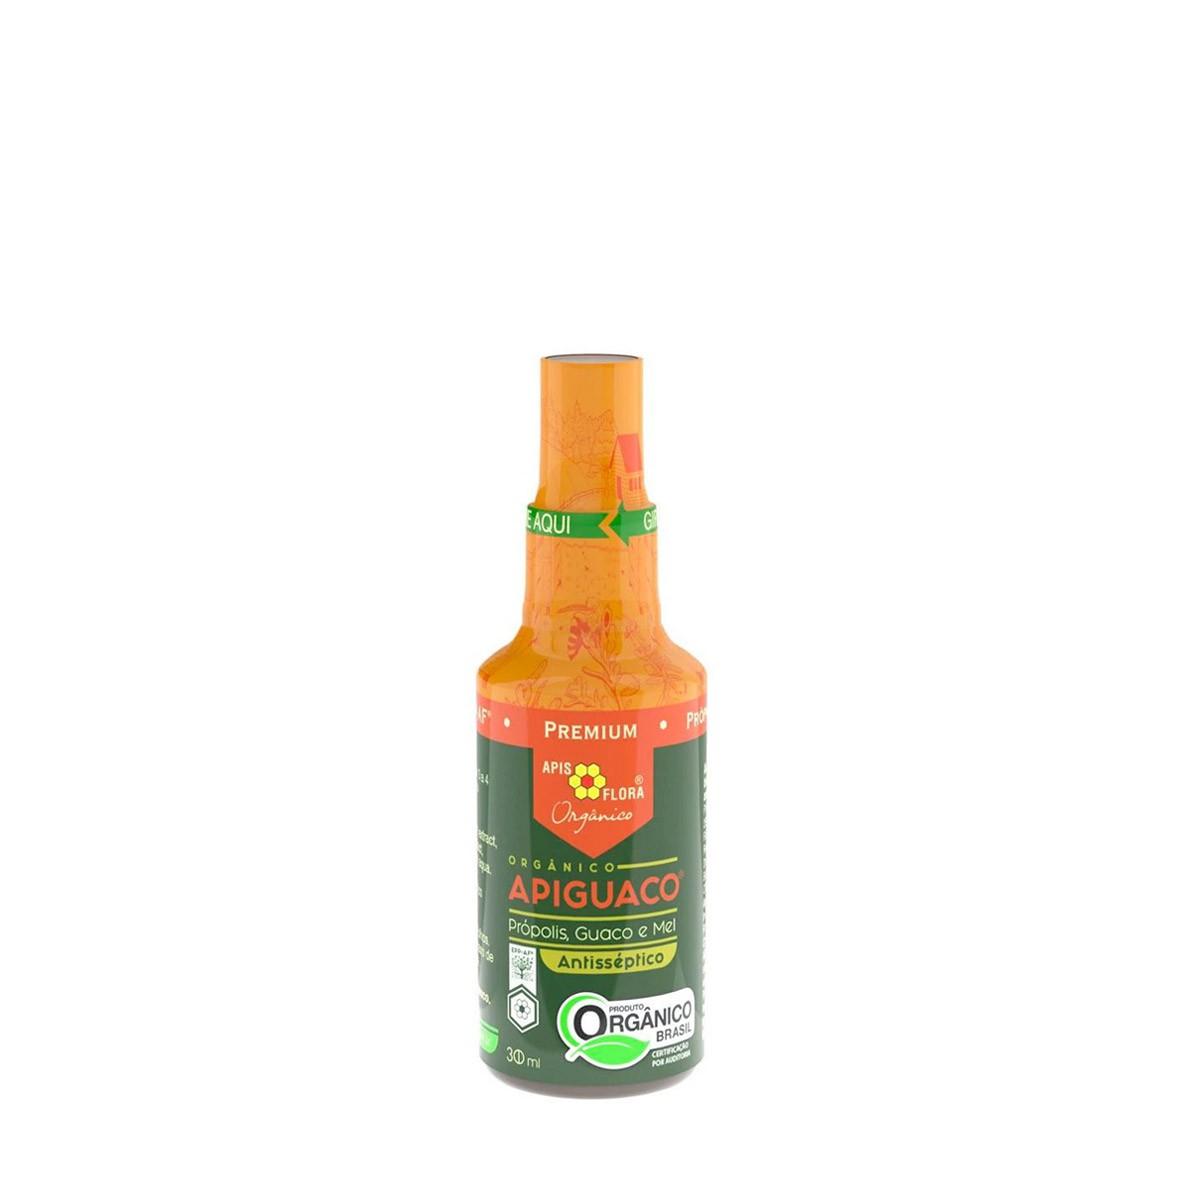 APIGUACO Spray Orgânico - Própolis, Mel e Guaco 30ml